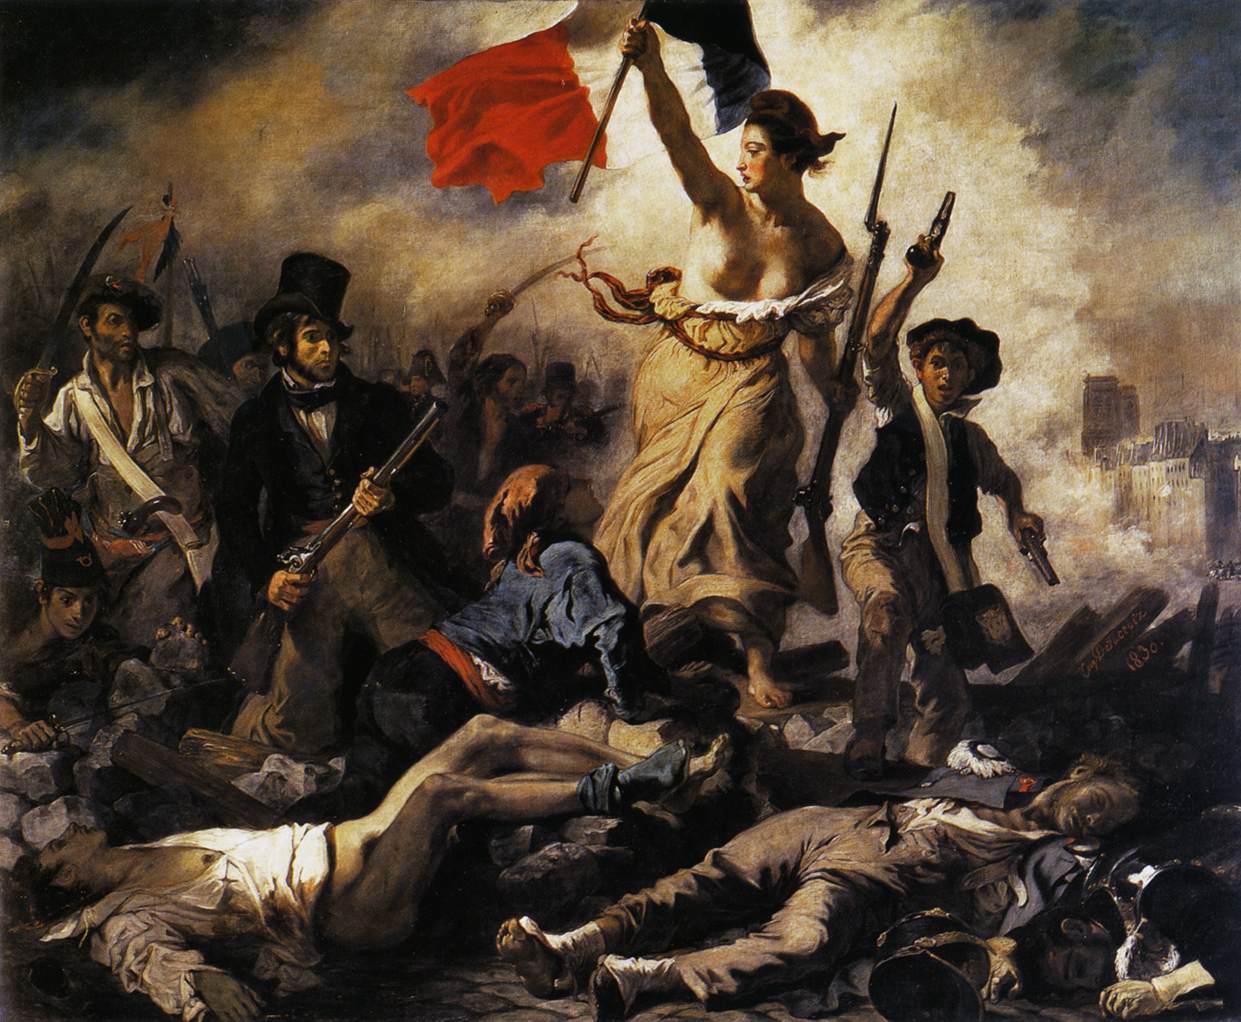 http://media.paperblog.fr/i/377/3778264/perpetuelle-revolution-francaise-L-1.jpeg